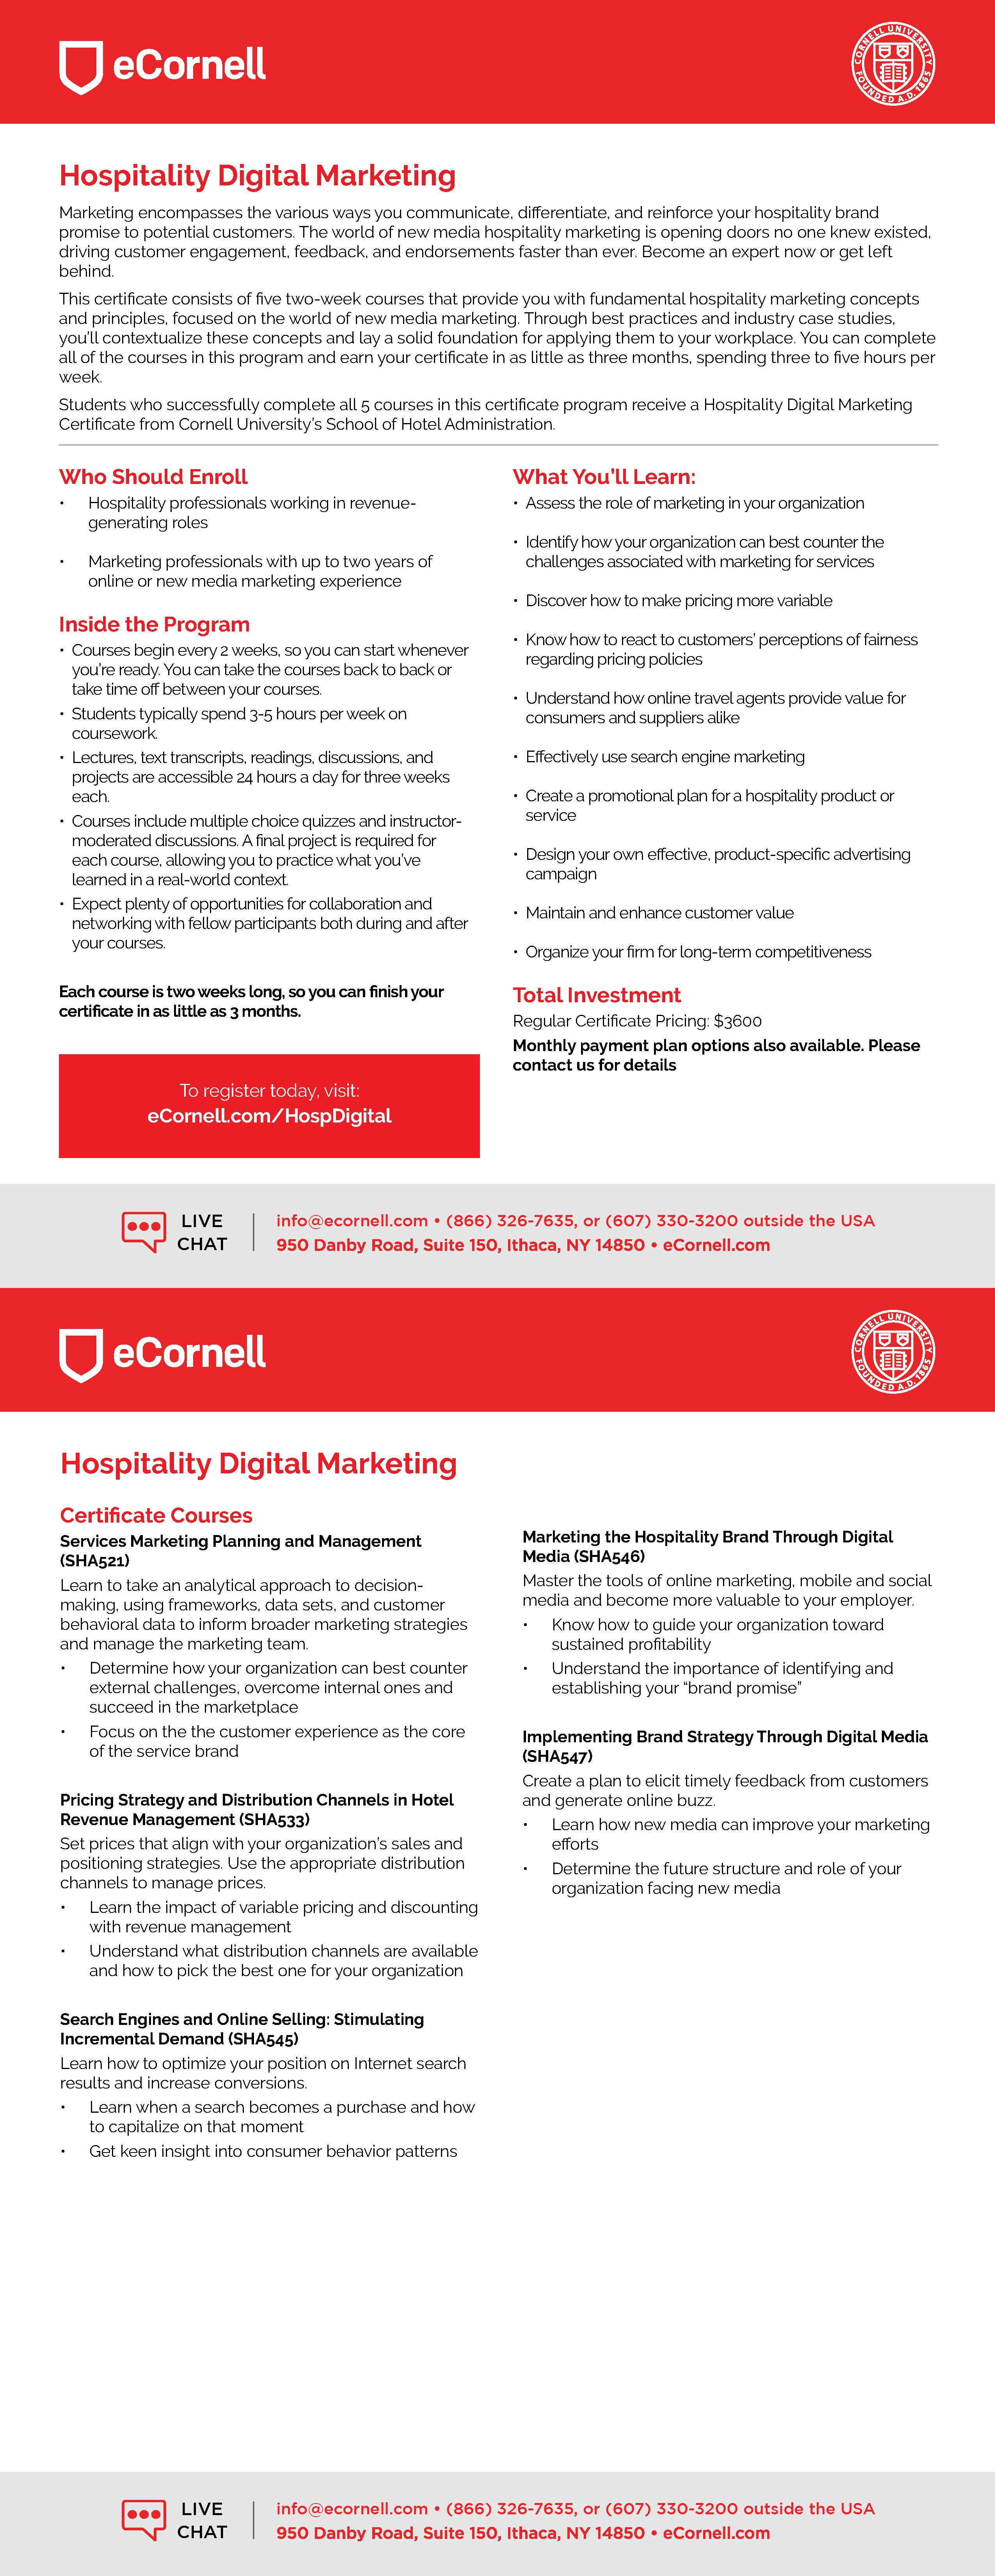 Hospitality Digital Marketing Flyer